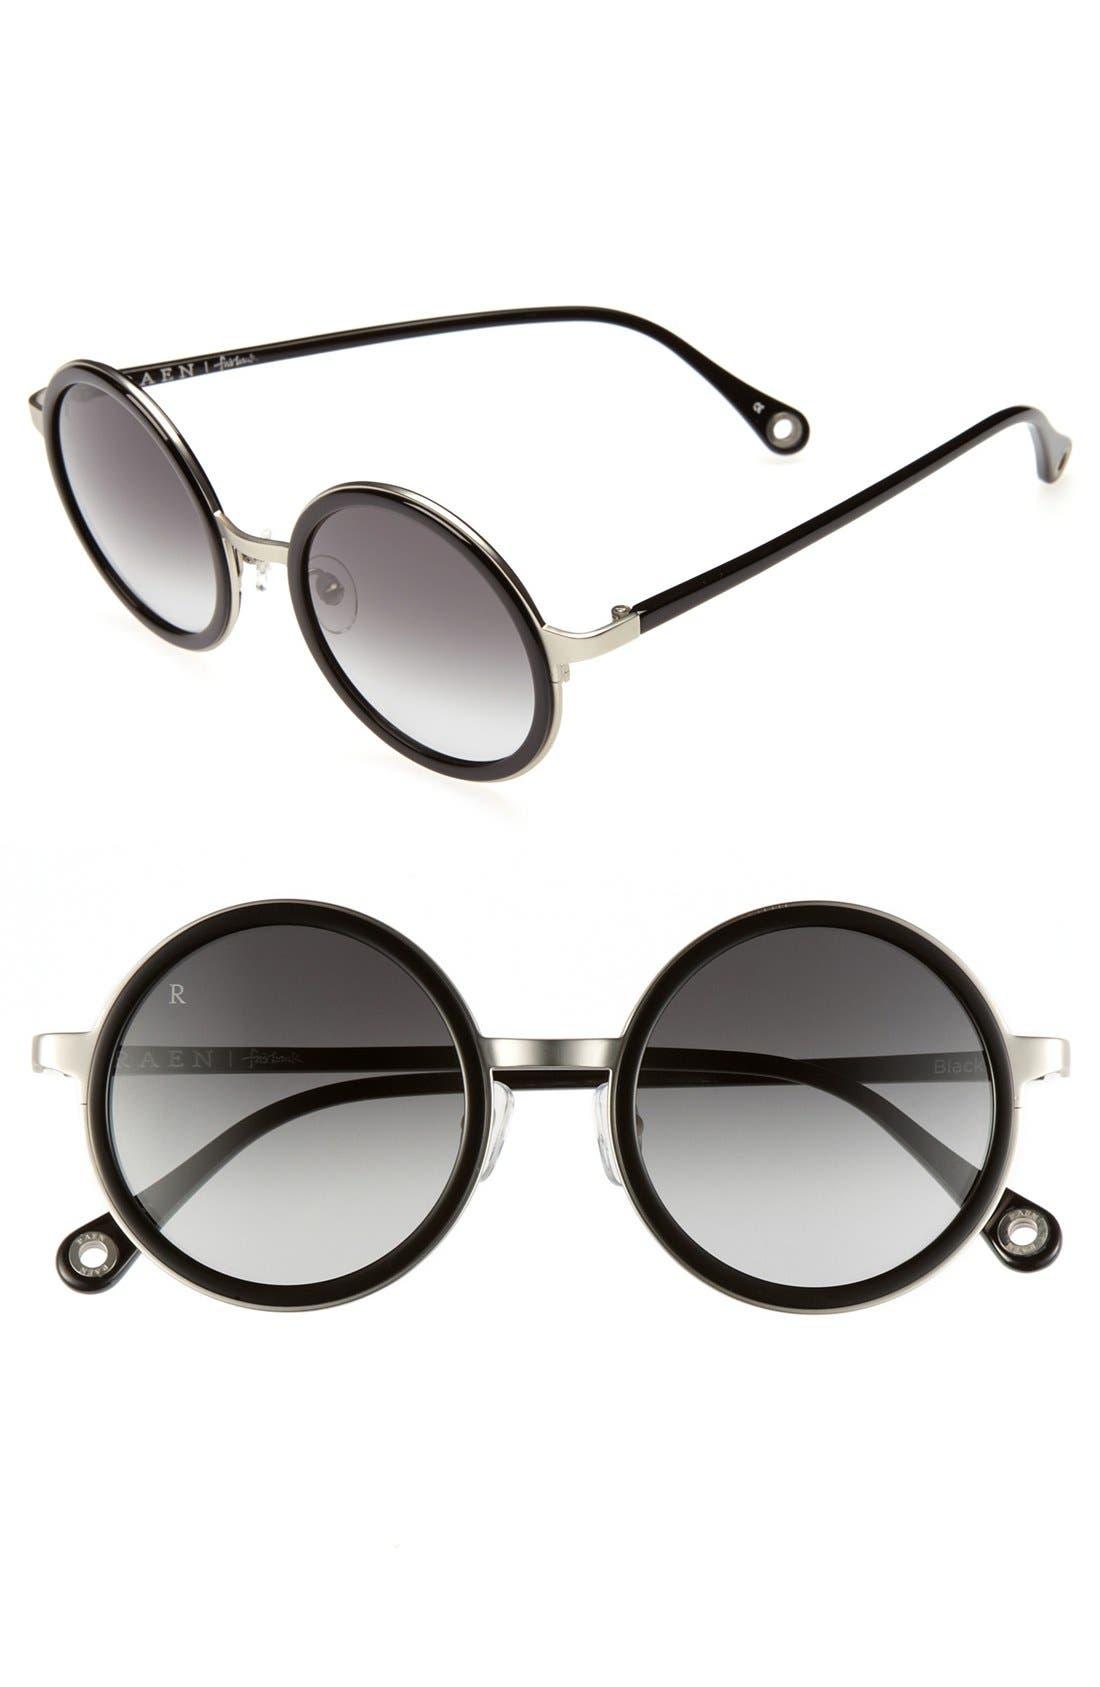 Alternate Image 1 Selected - RAEN 'Fairbank' 54mm Sunglasses